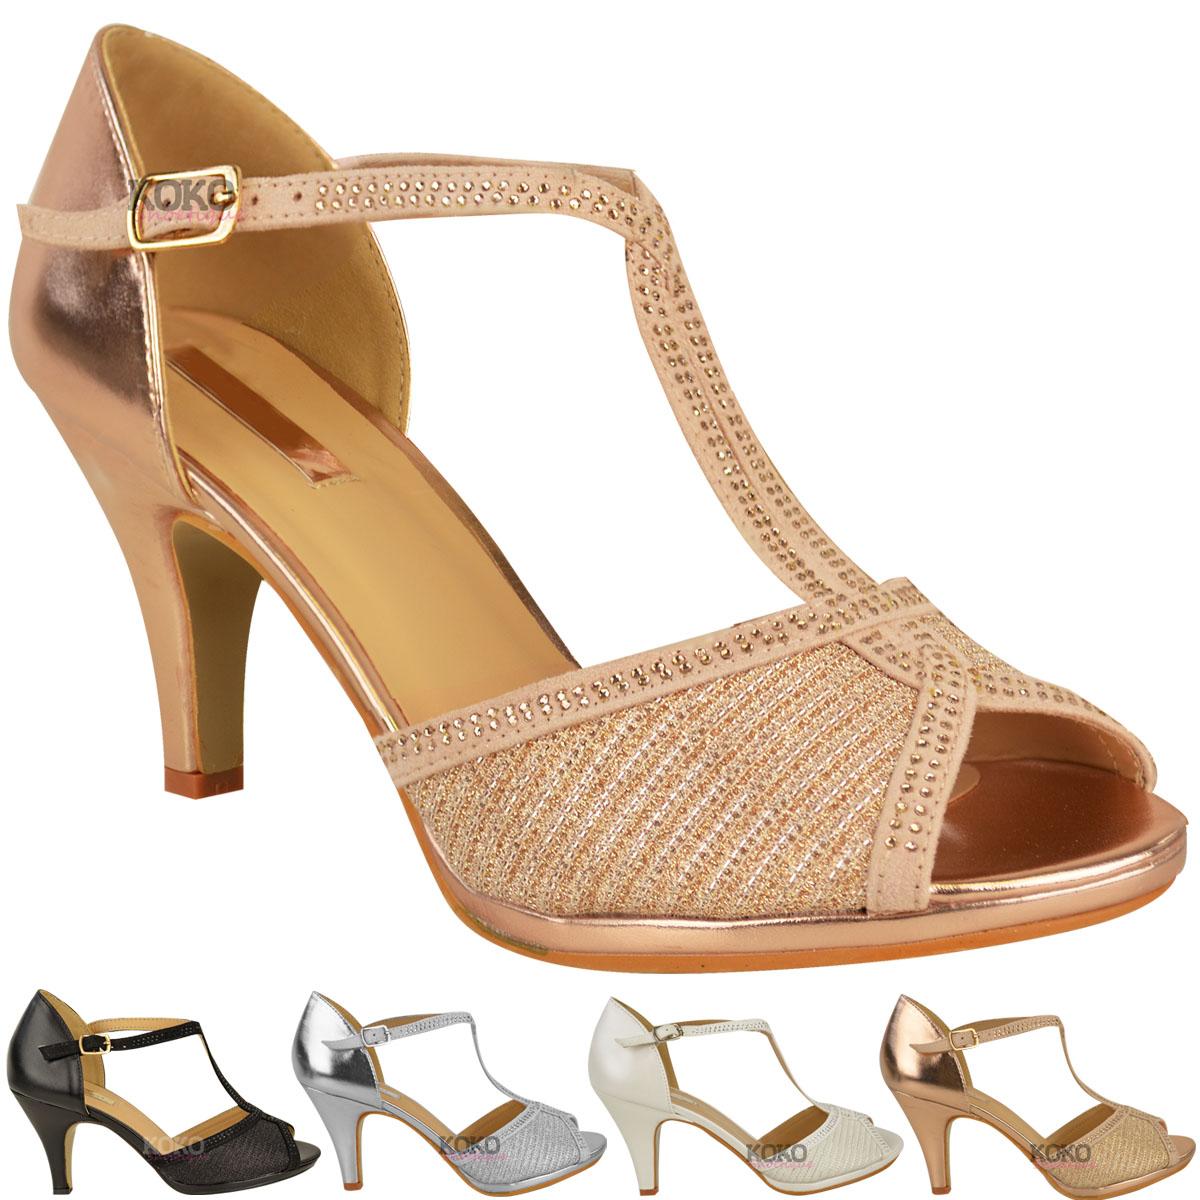 womens ladies wedding bridal shoes prom high heel diamante party sandals size ebay. Black Bedroom Furniture Sets. Home Design Ideas